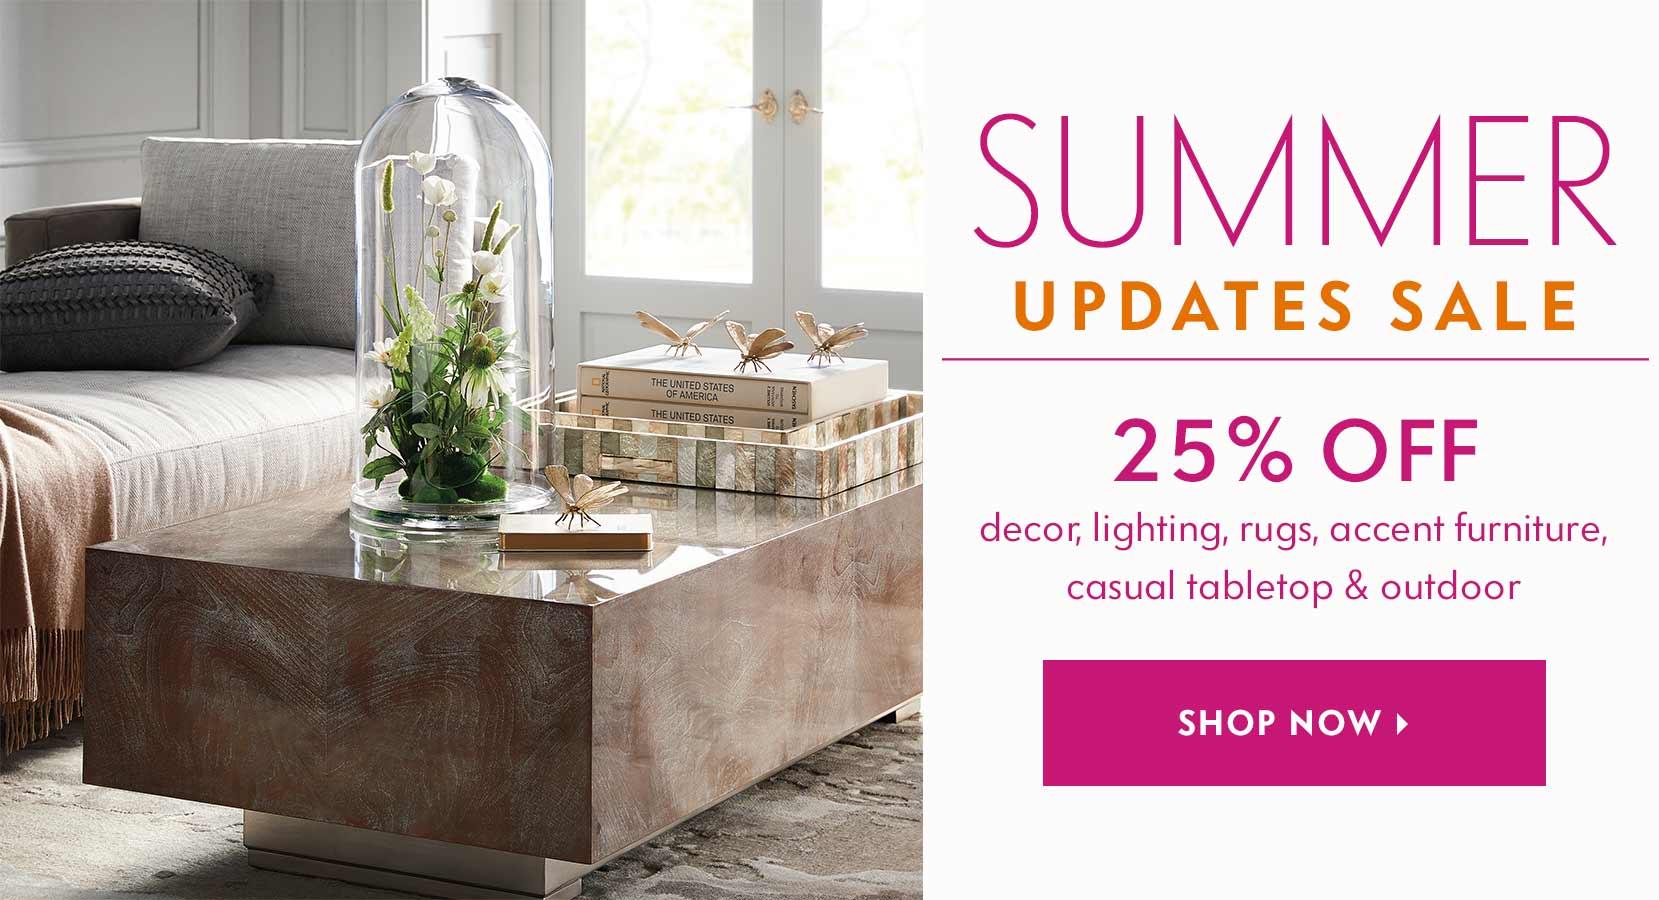 Sale Savings Furniture Decor Art Lighting Bedding Sheets Towels Duvet  Covers Tabletop Dinnerware Flatware Glassware Outdoor